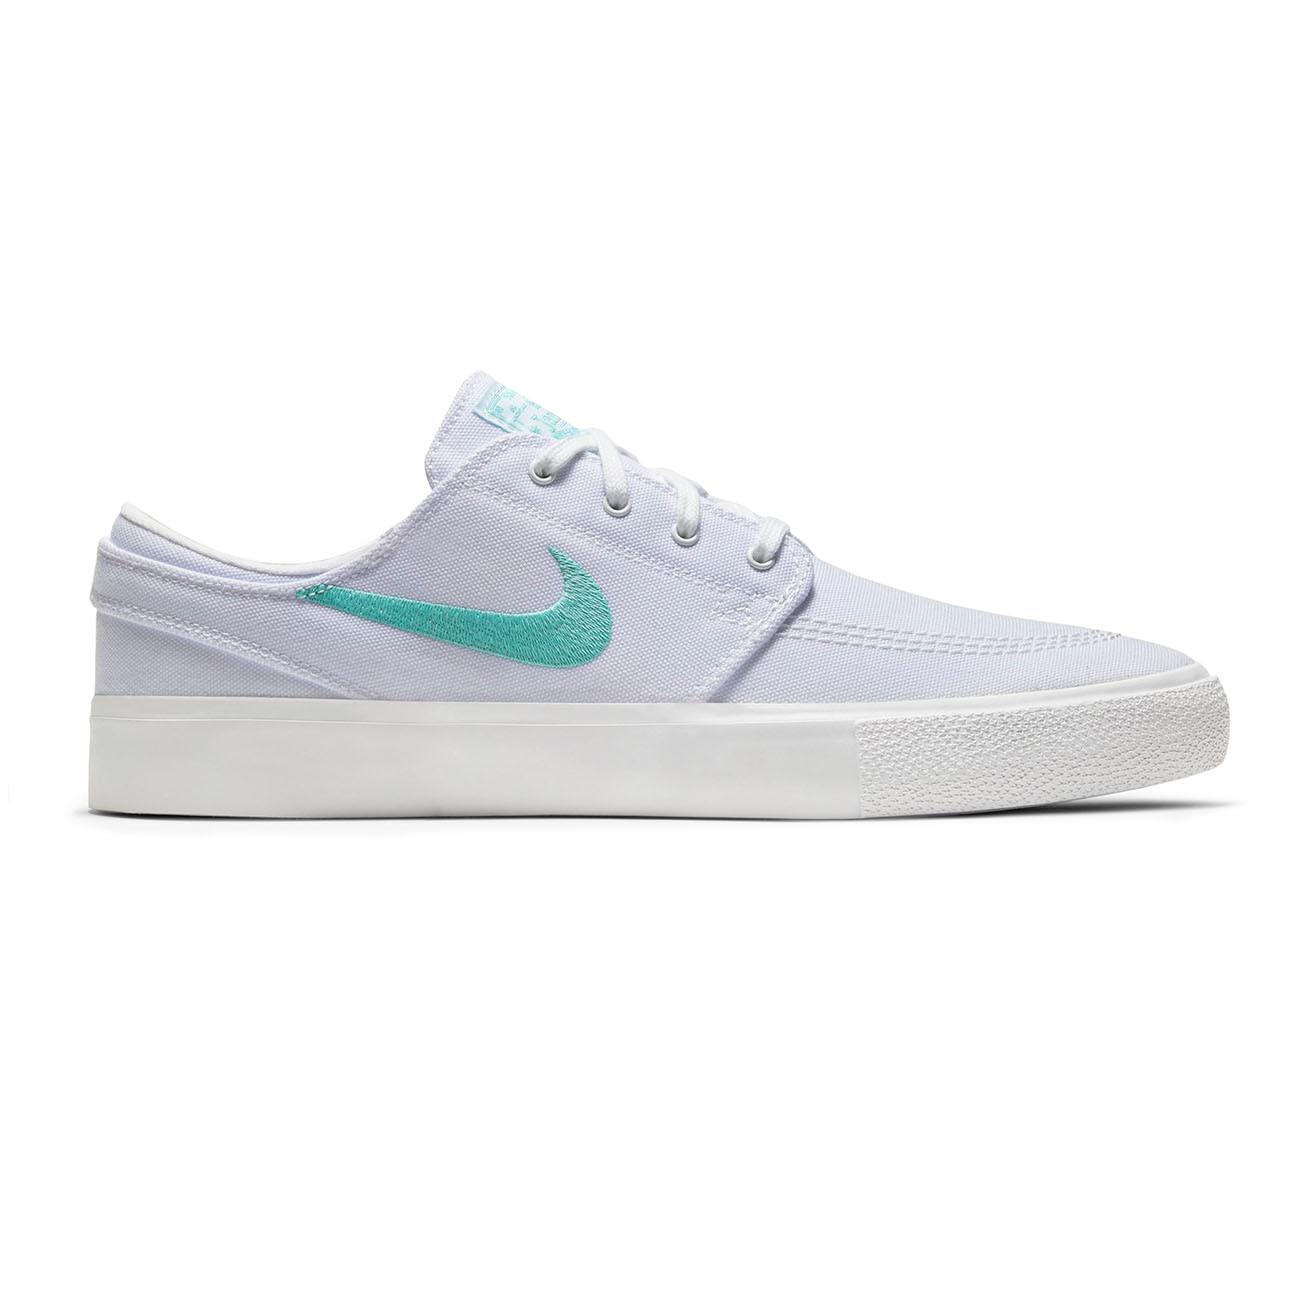 fecha atractivo simpatía  Skate shoes Nike SB Zoom Stefan Janoski Canvas RM Premium white/tropical  twist-white | Snowboard Zezula